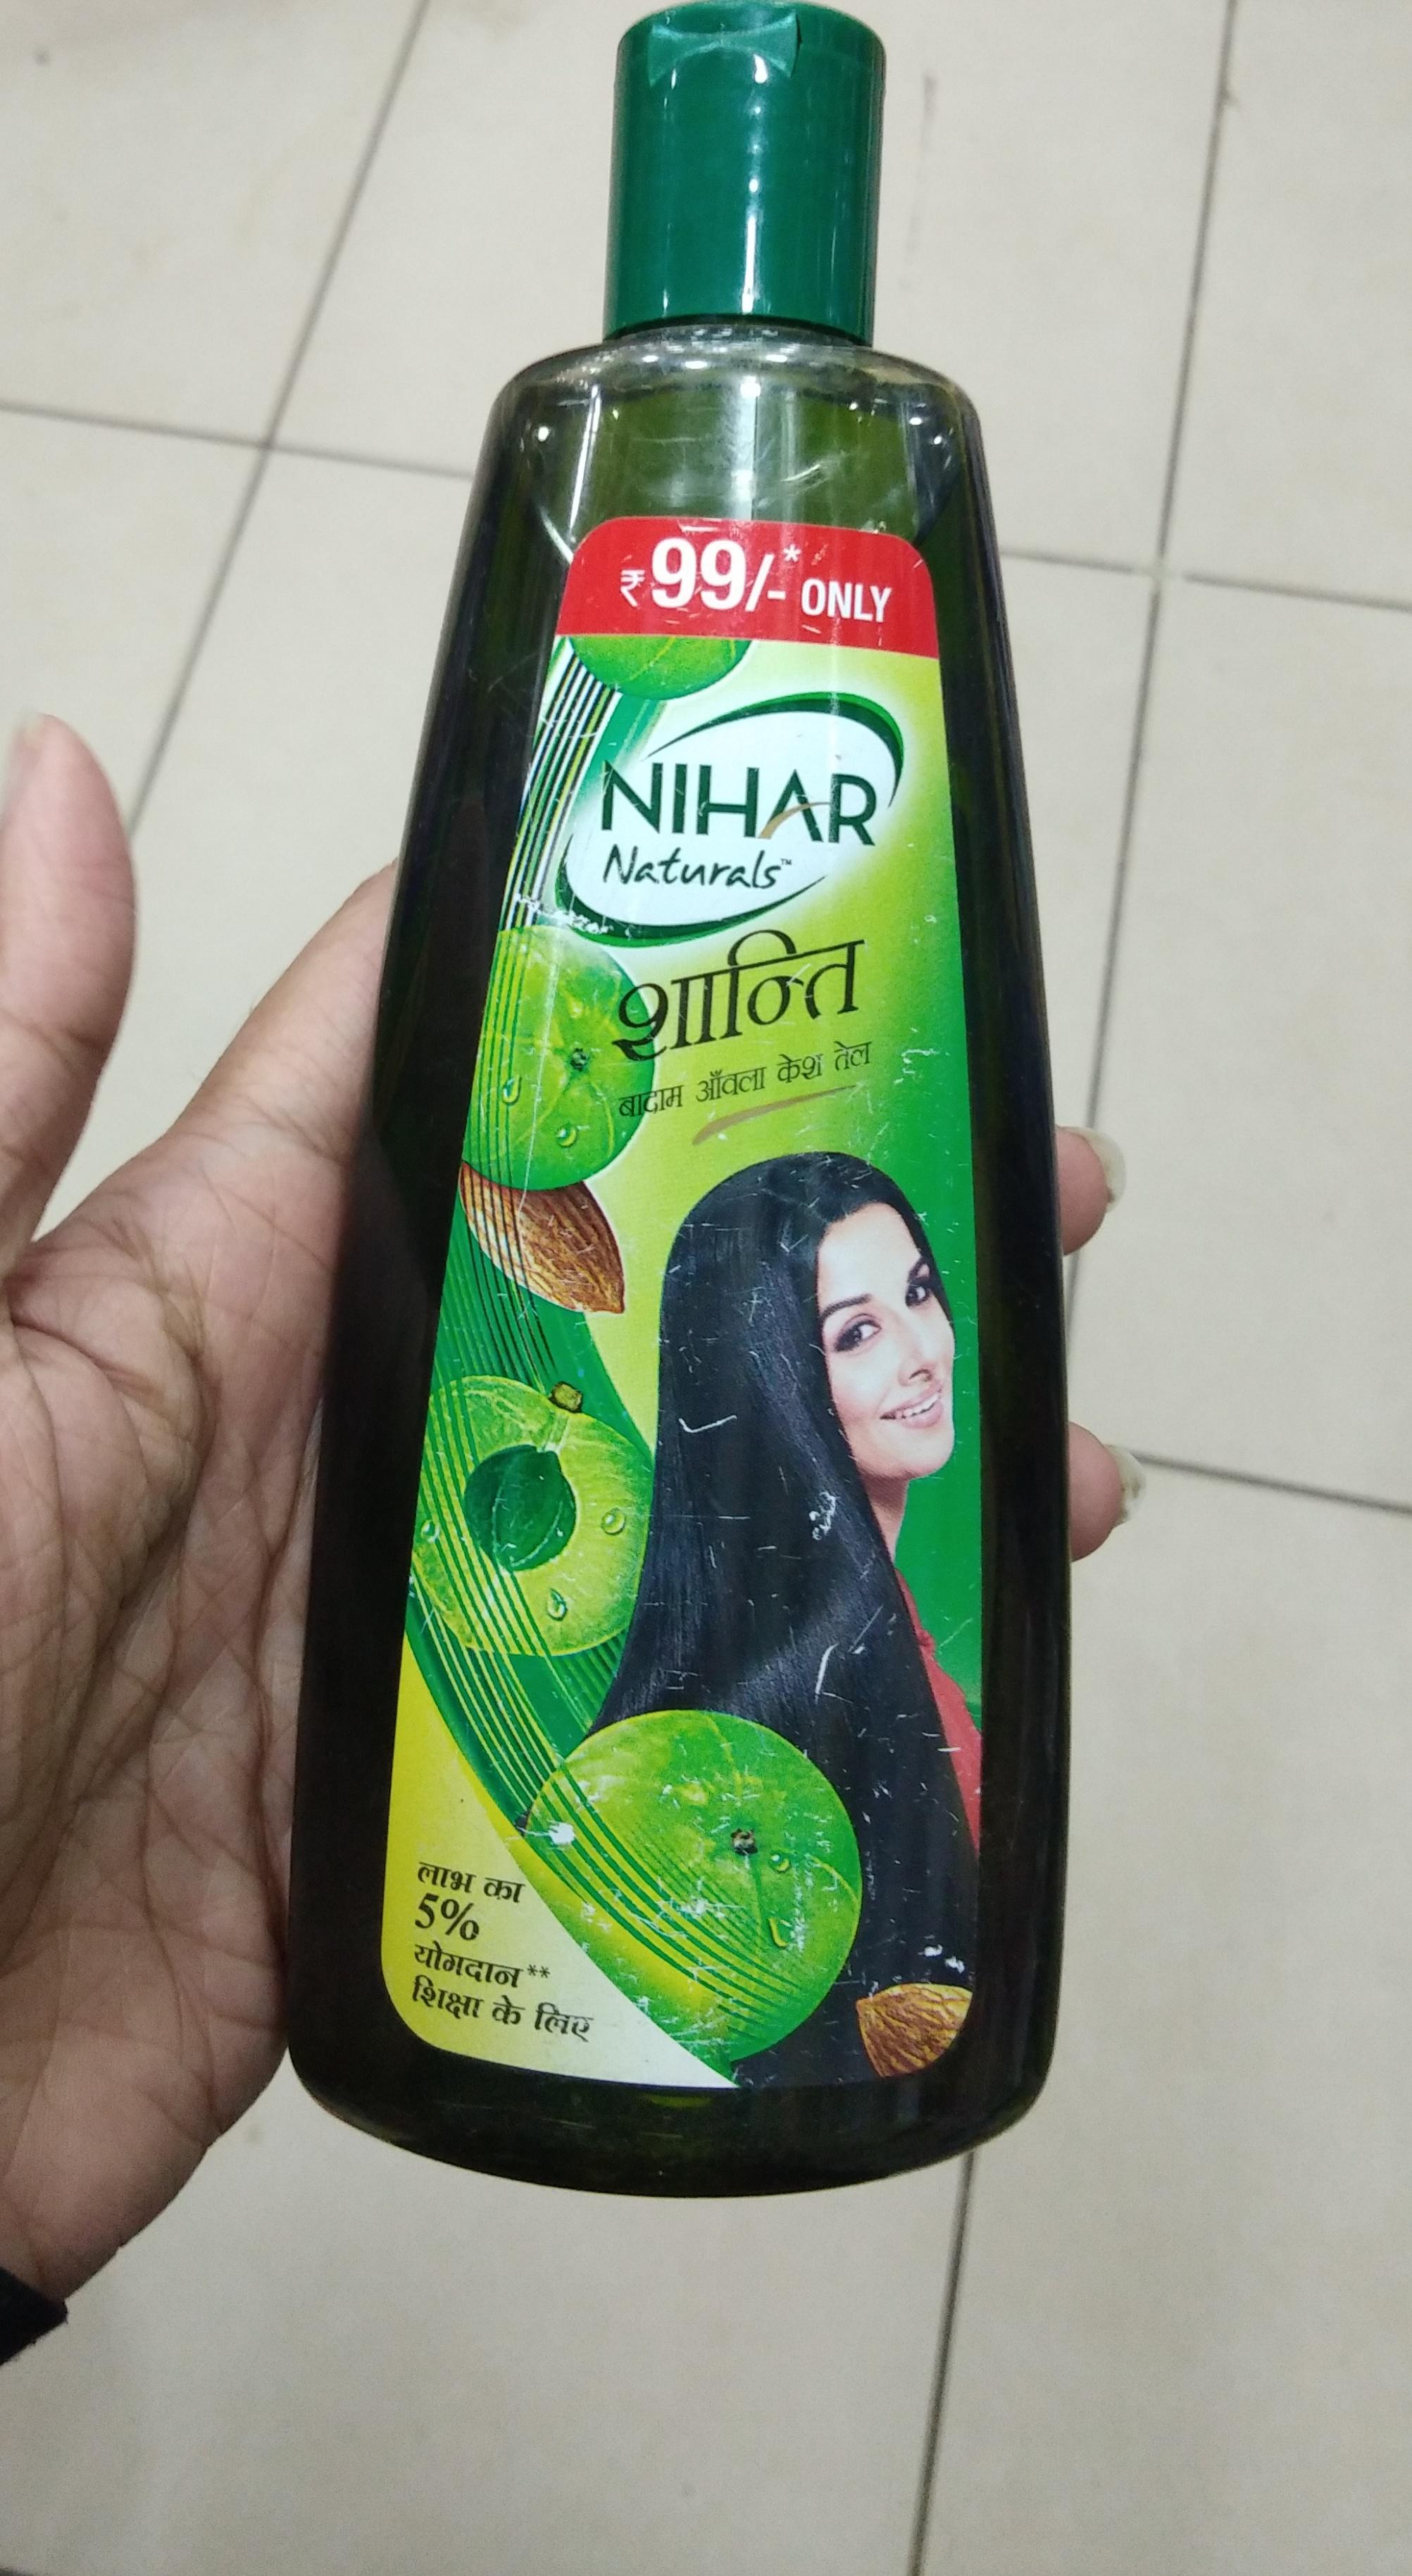 Nihar Shanti Amla Hair Oil pic 2-Not satisfied-By Nasreen